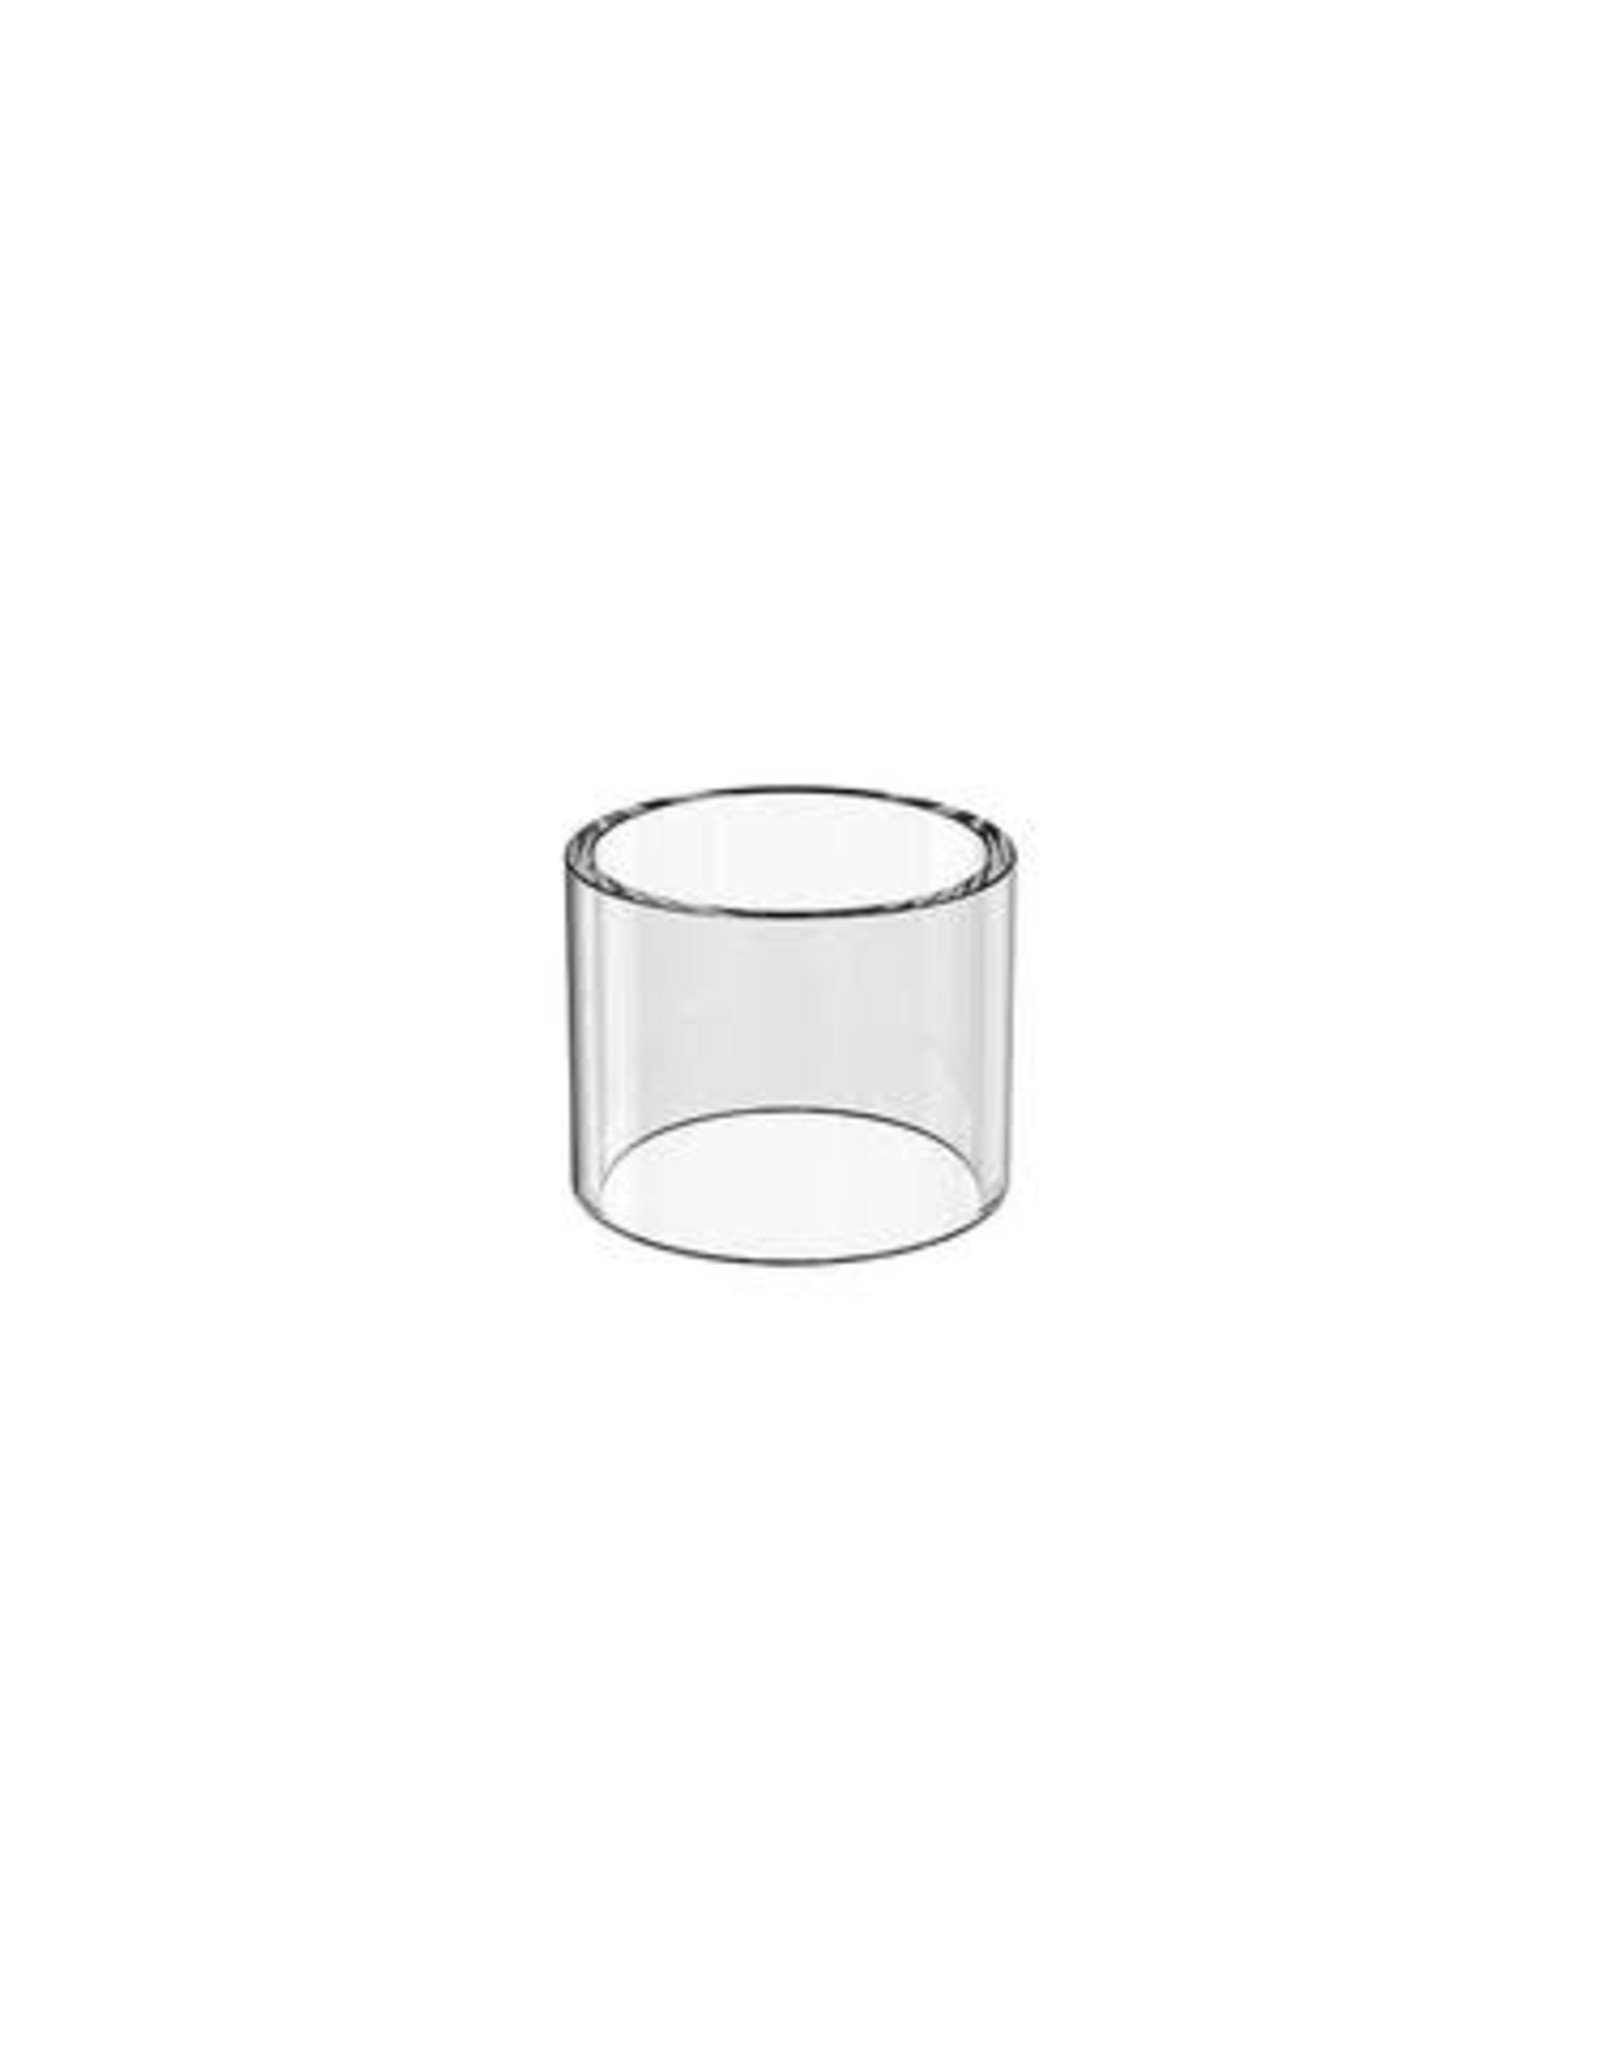 Aspire Nautilus 3 Replacement Glass